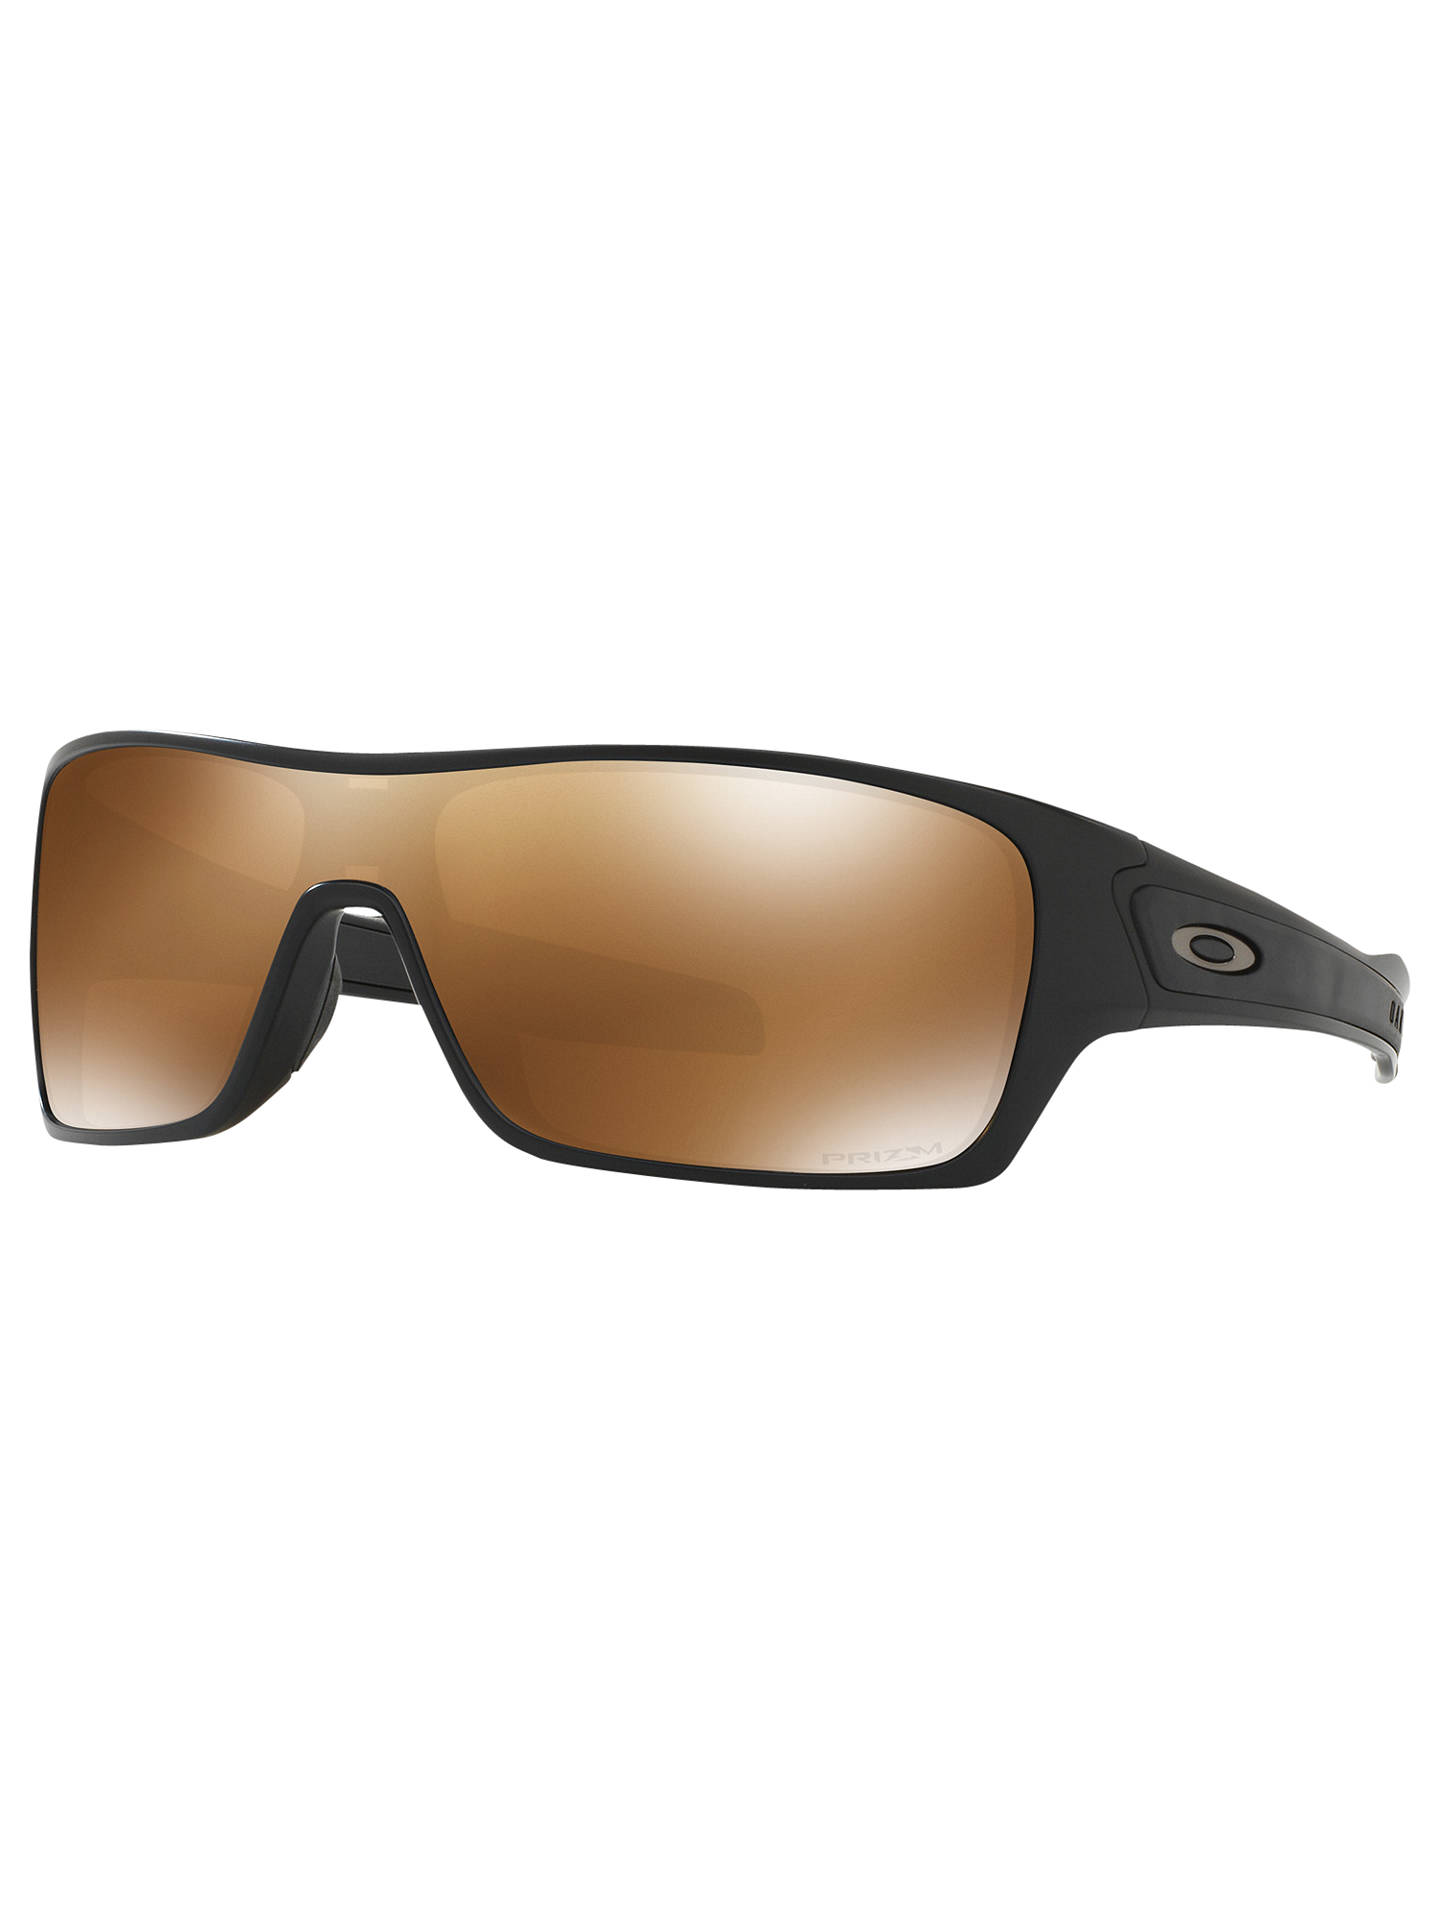 80520b6473 ... good buyoakley oo9307 turbine rotor prizm polarised rectangular sunglasses  matte black mirror brown online at fdb9e